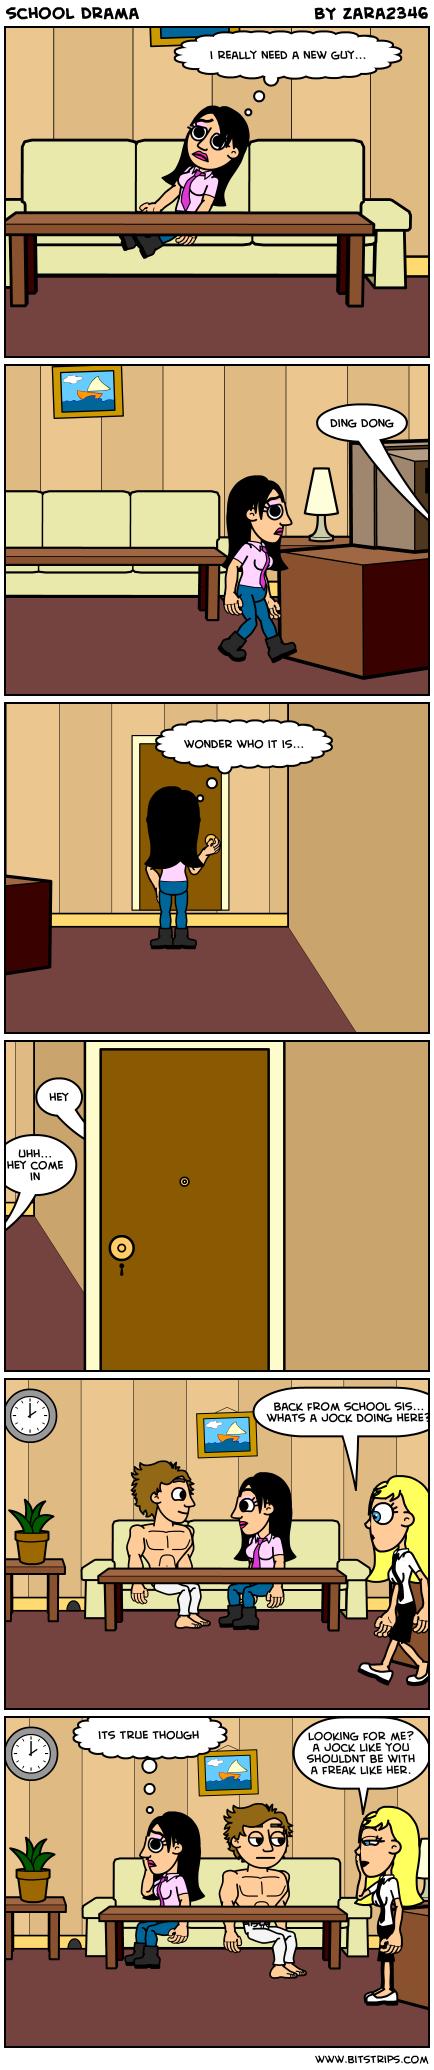 school drama